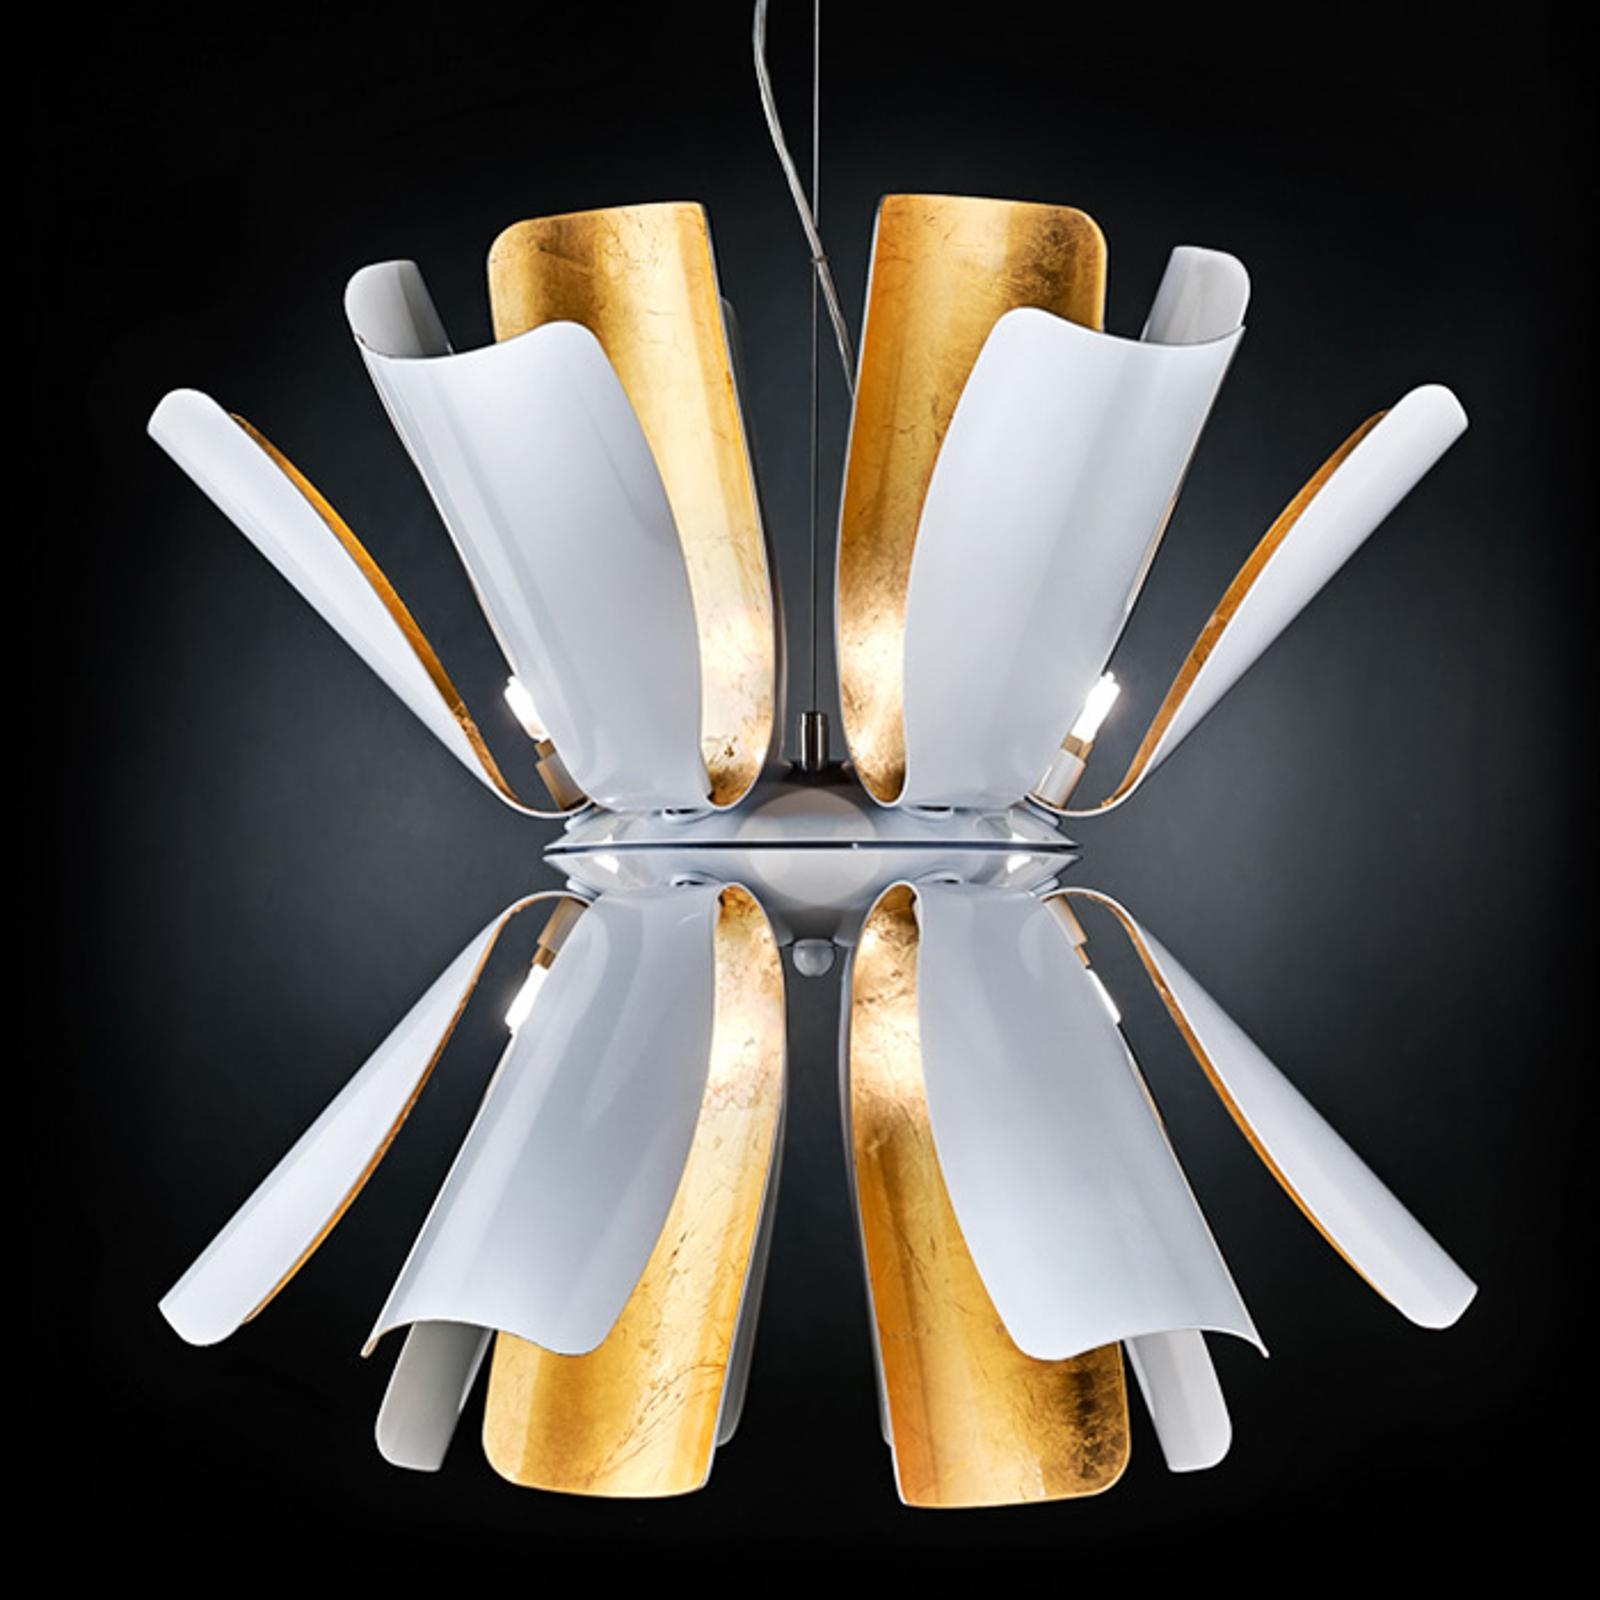 Suspension design Tropic 60cm blanche/feuille or